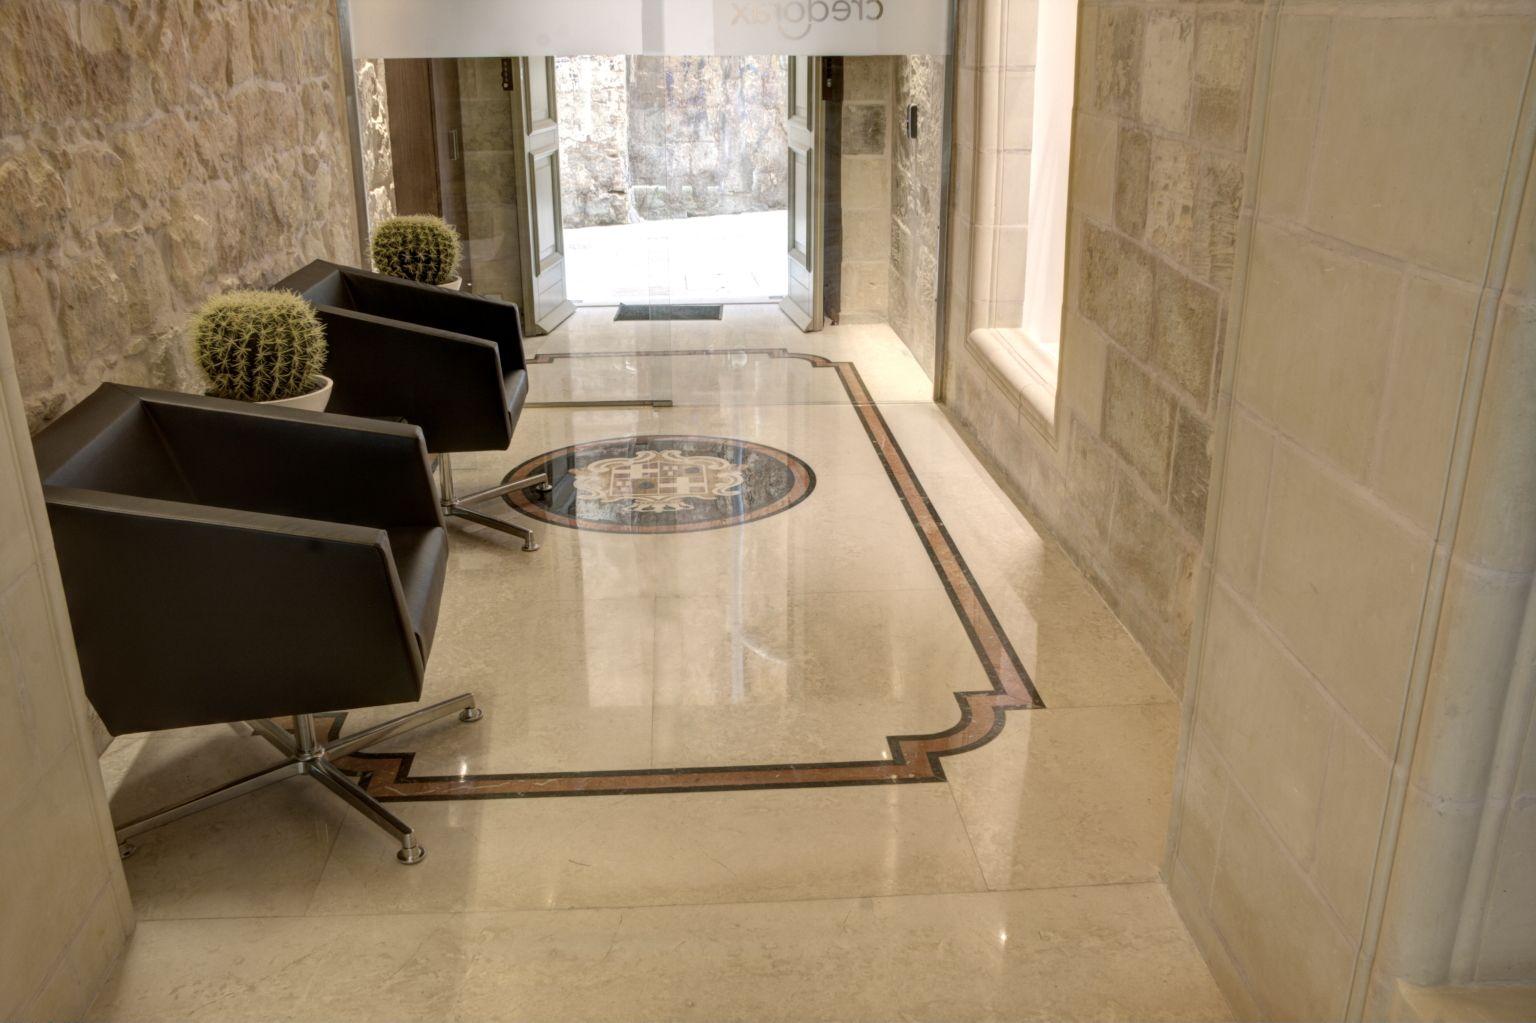 Botticino Marble Tiles In Hallway